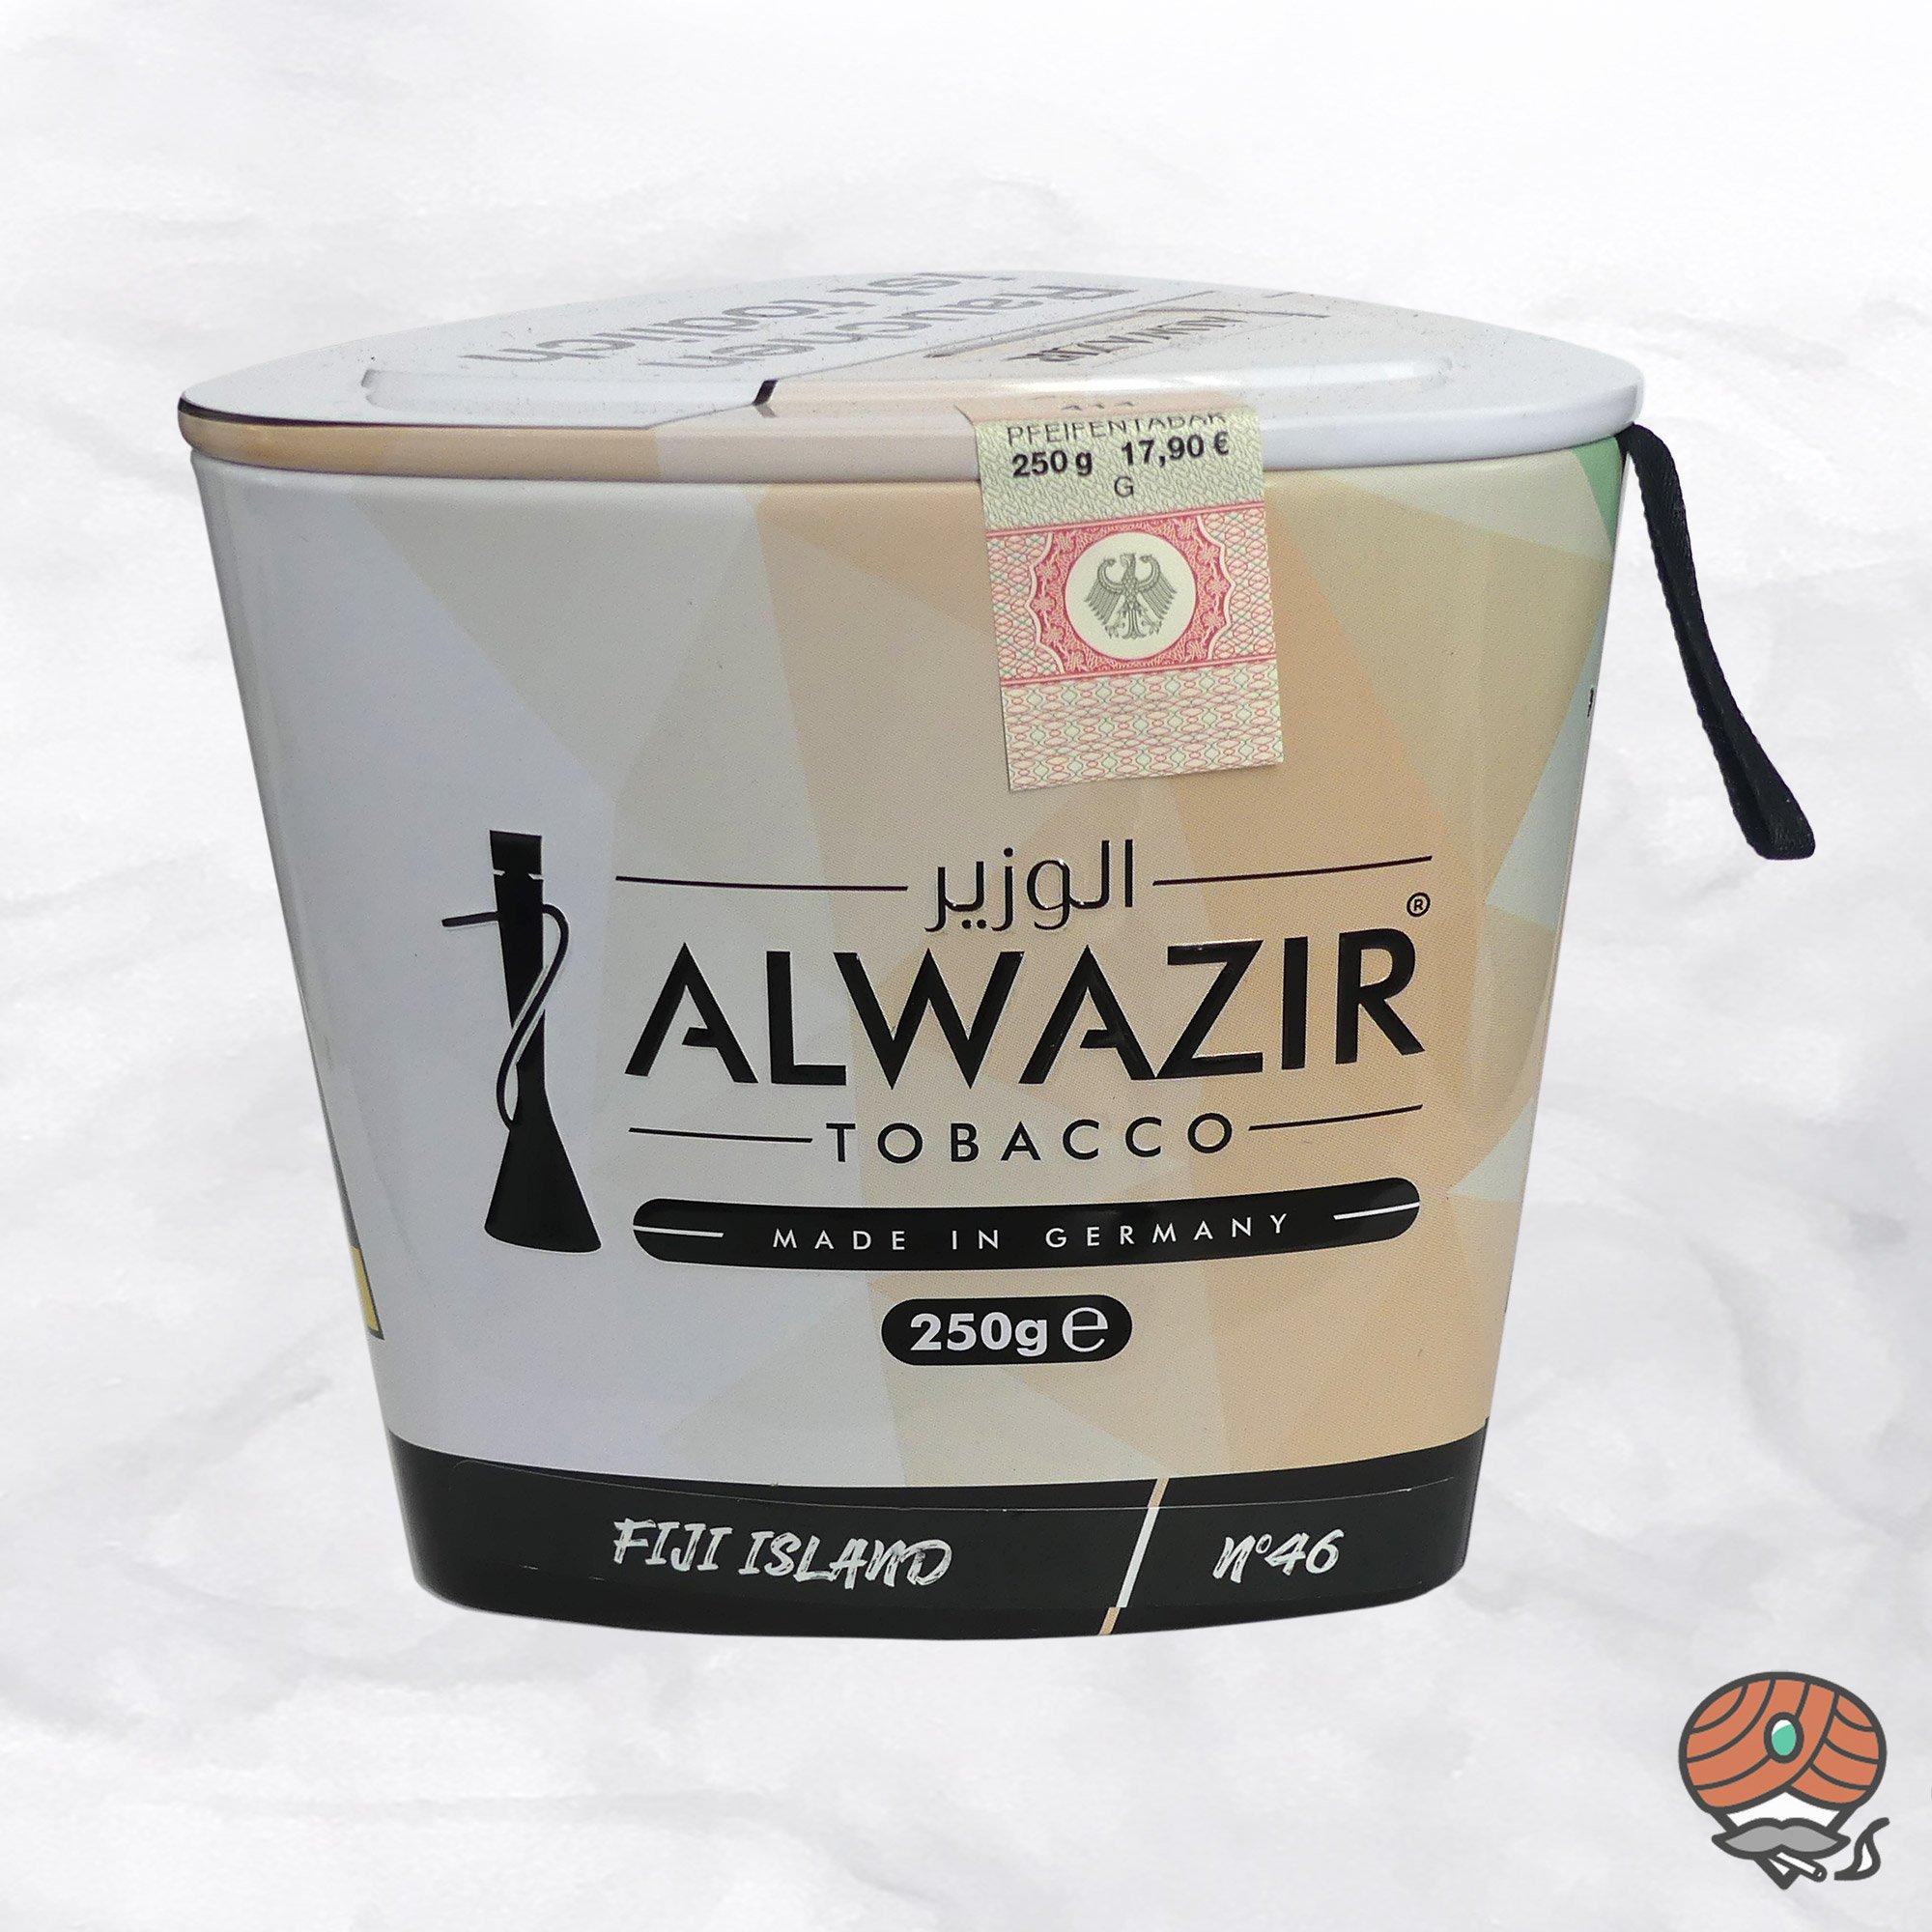 Alwazir Shisha Tabak - No. 46 - FIJI ISLAND 250g